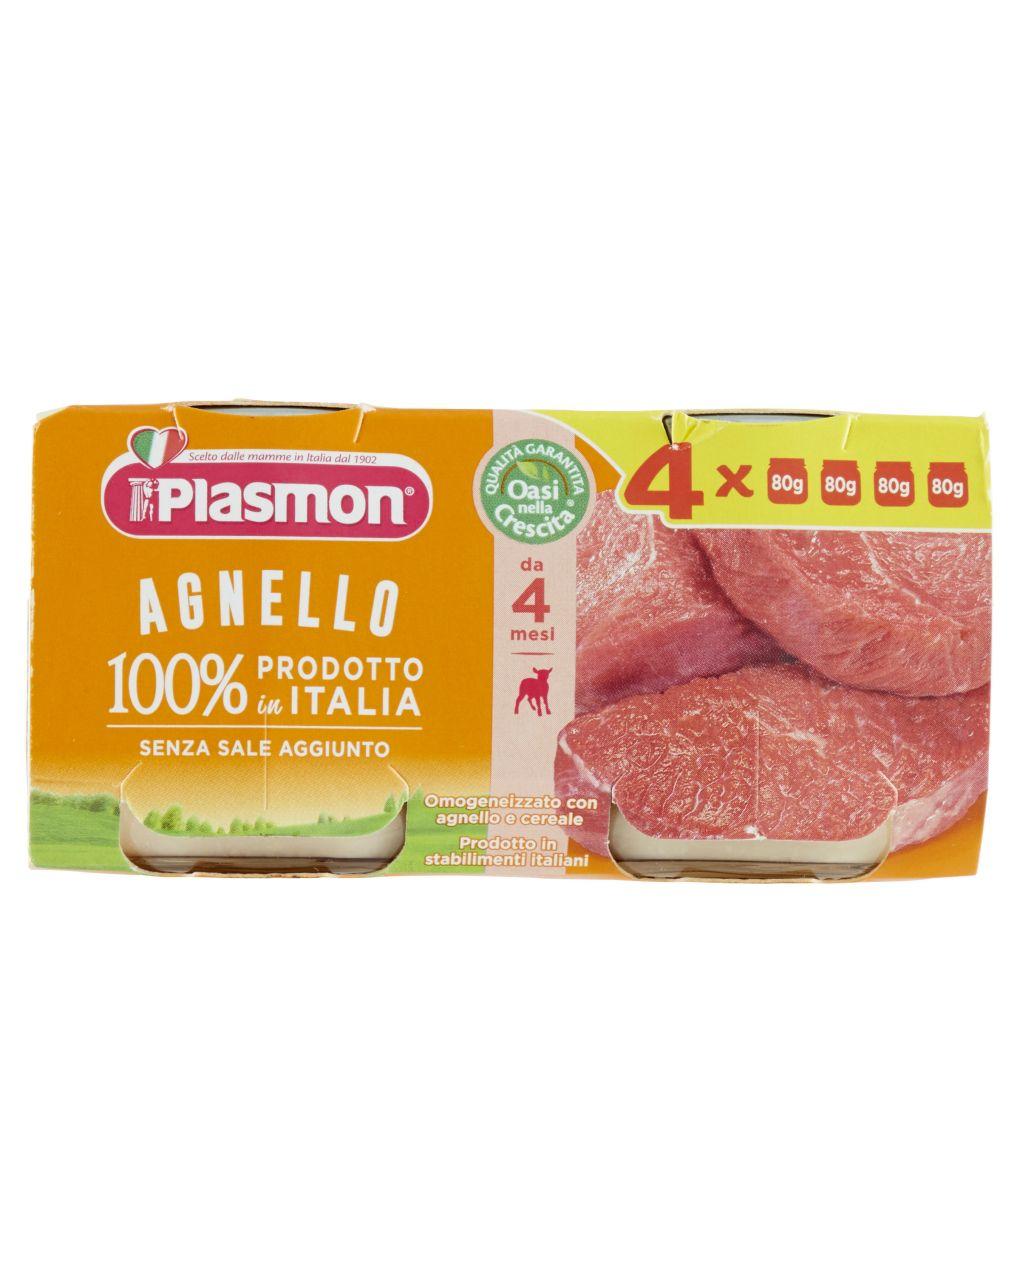 Plasmon - omogeneizzato agnello 4x80g - Plasmon